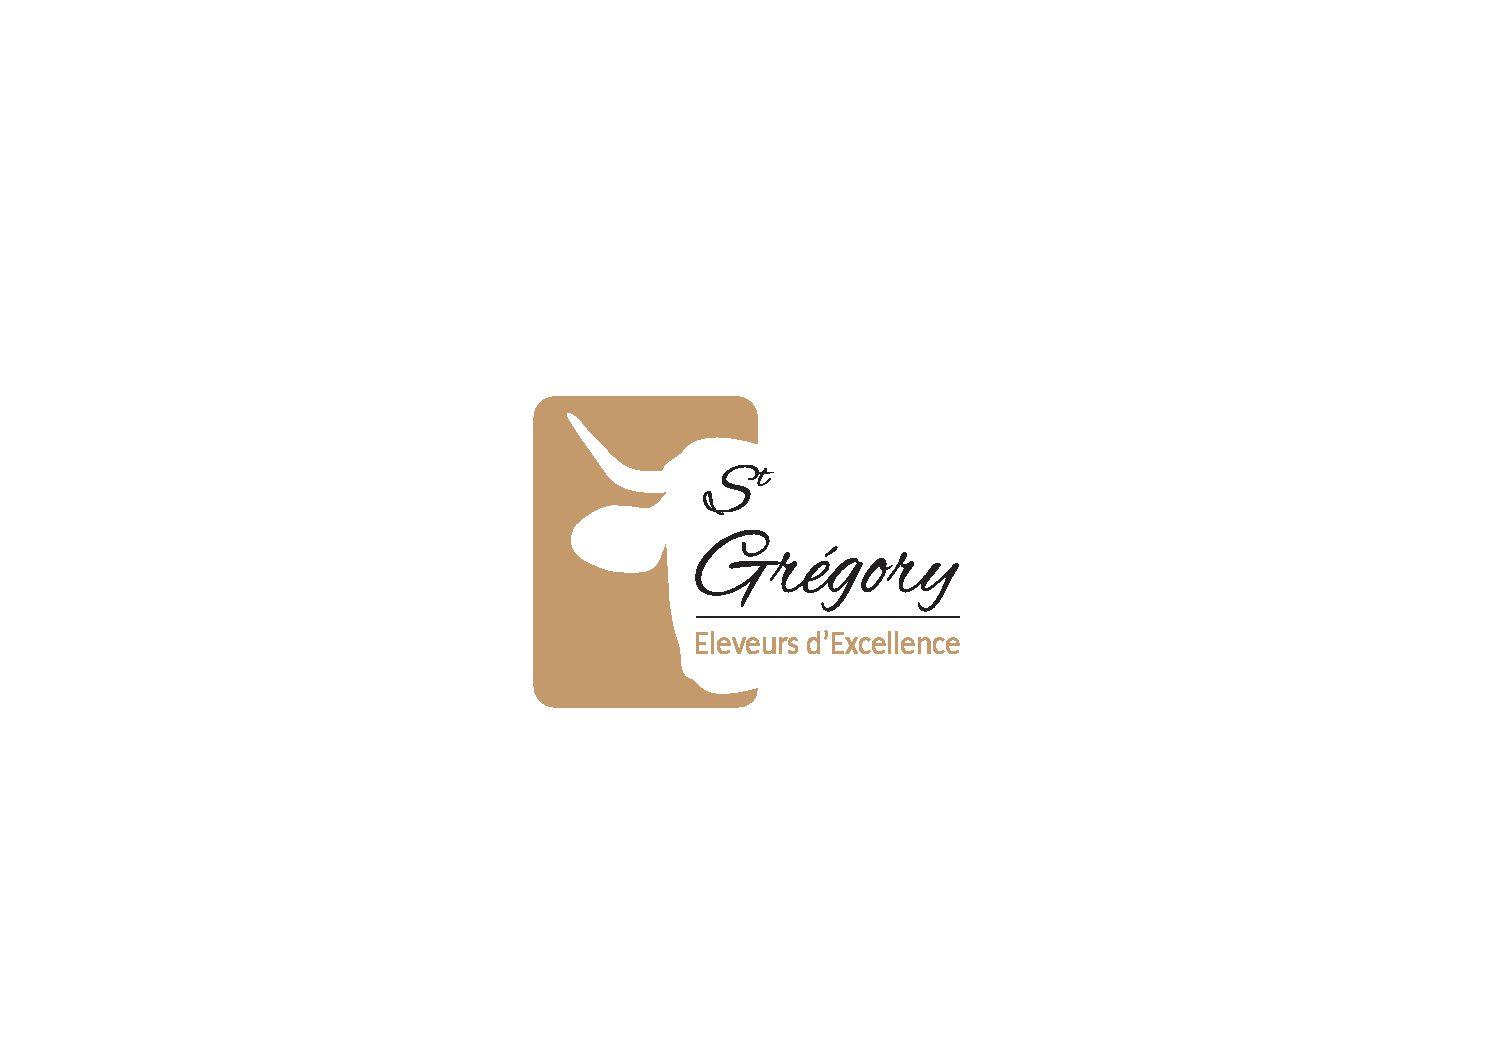 ST GRÉGORY